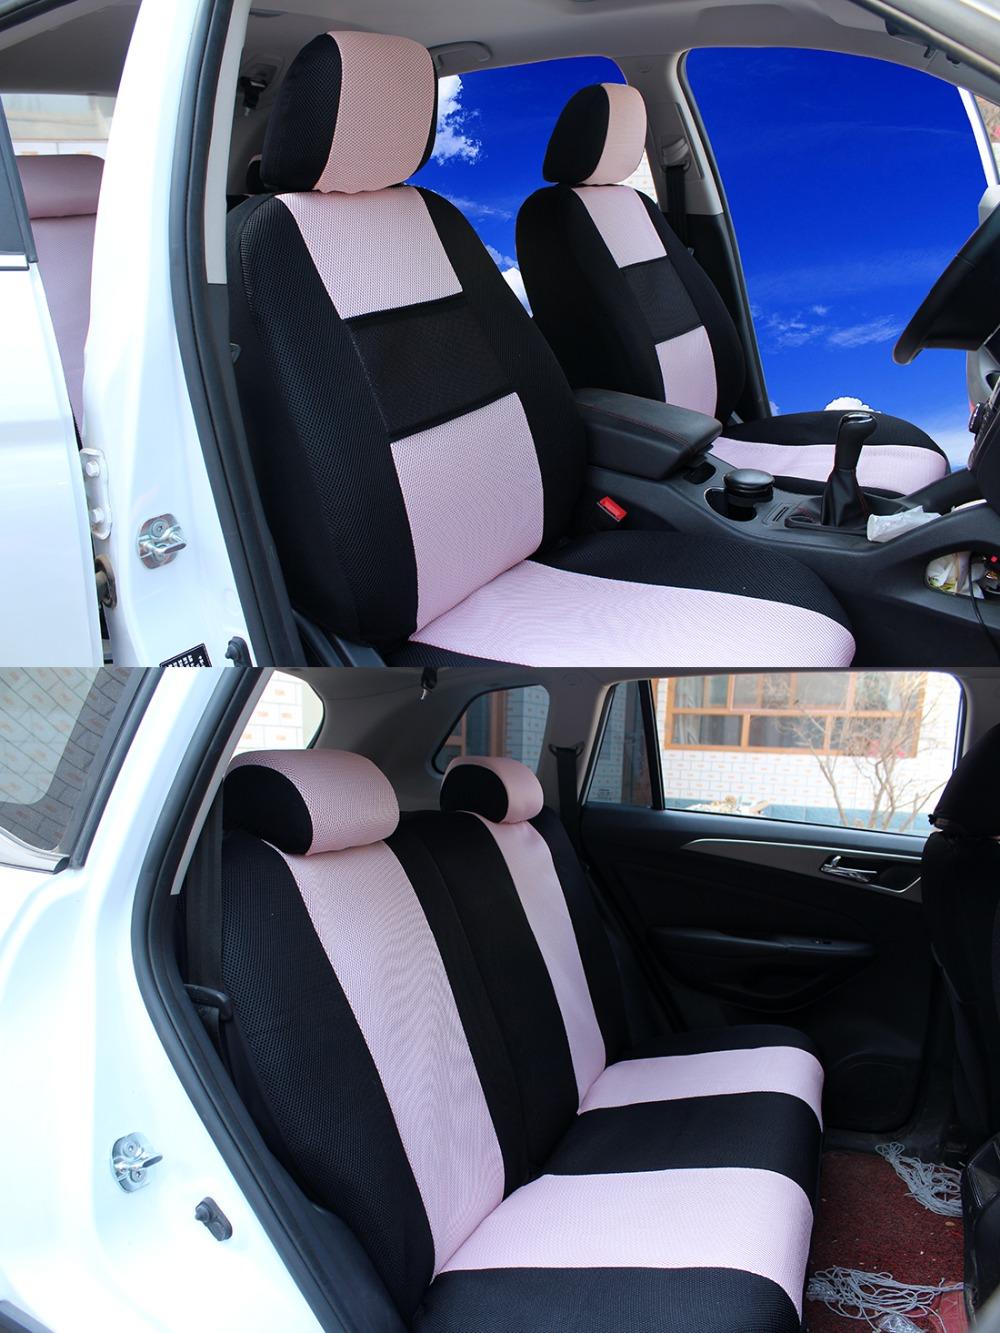 2 front seats universal car seat covers for toyota corolla camry rav4 vitz auris prius yaris. Black Bedroom Furniture Sets. Home Design Ideas